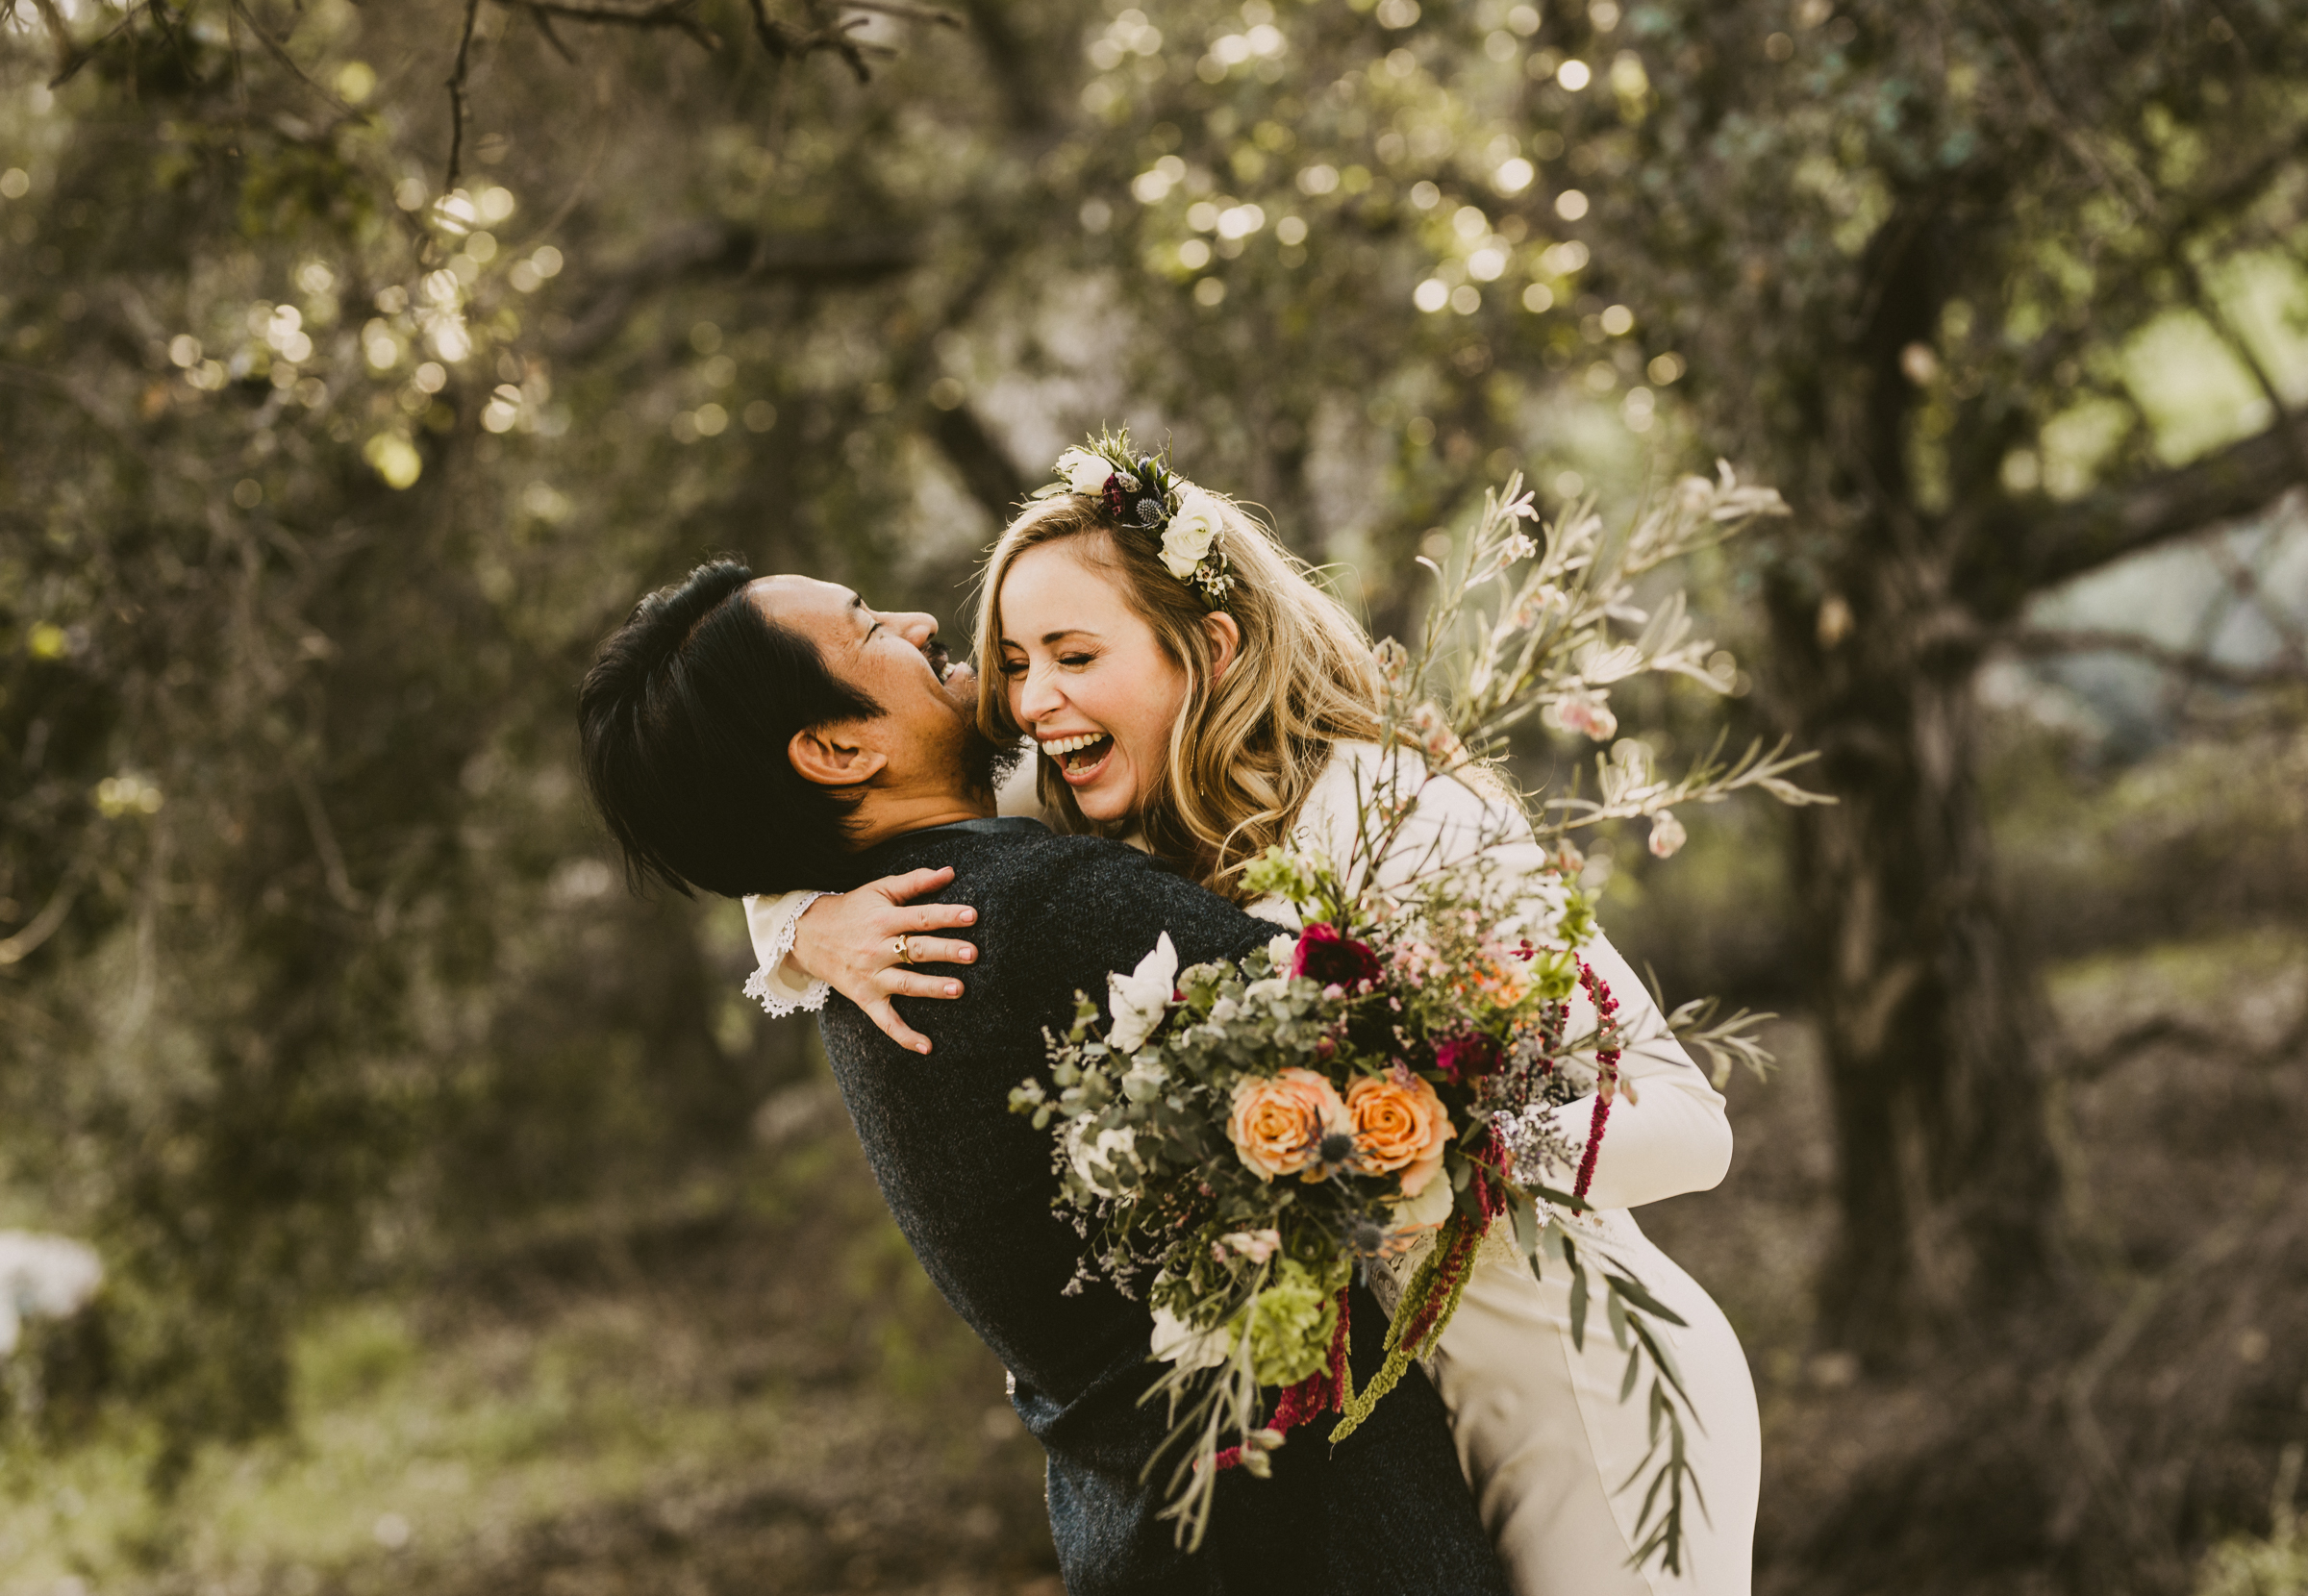 ©Isaiah + Taylor Photography - Intimate Elopement, Eaton Canyon, Los Angeles Wedding Photographer-16.jpg